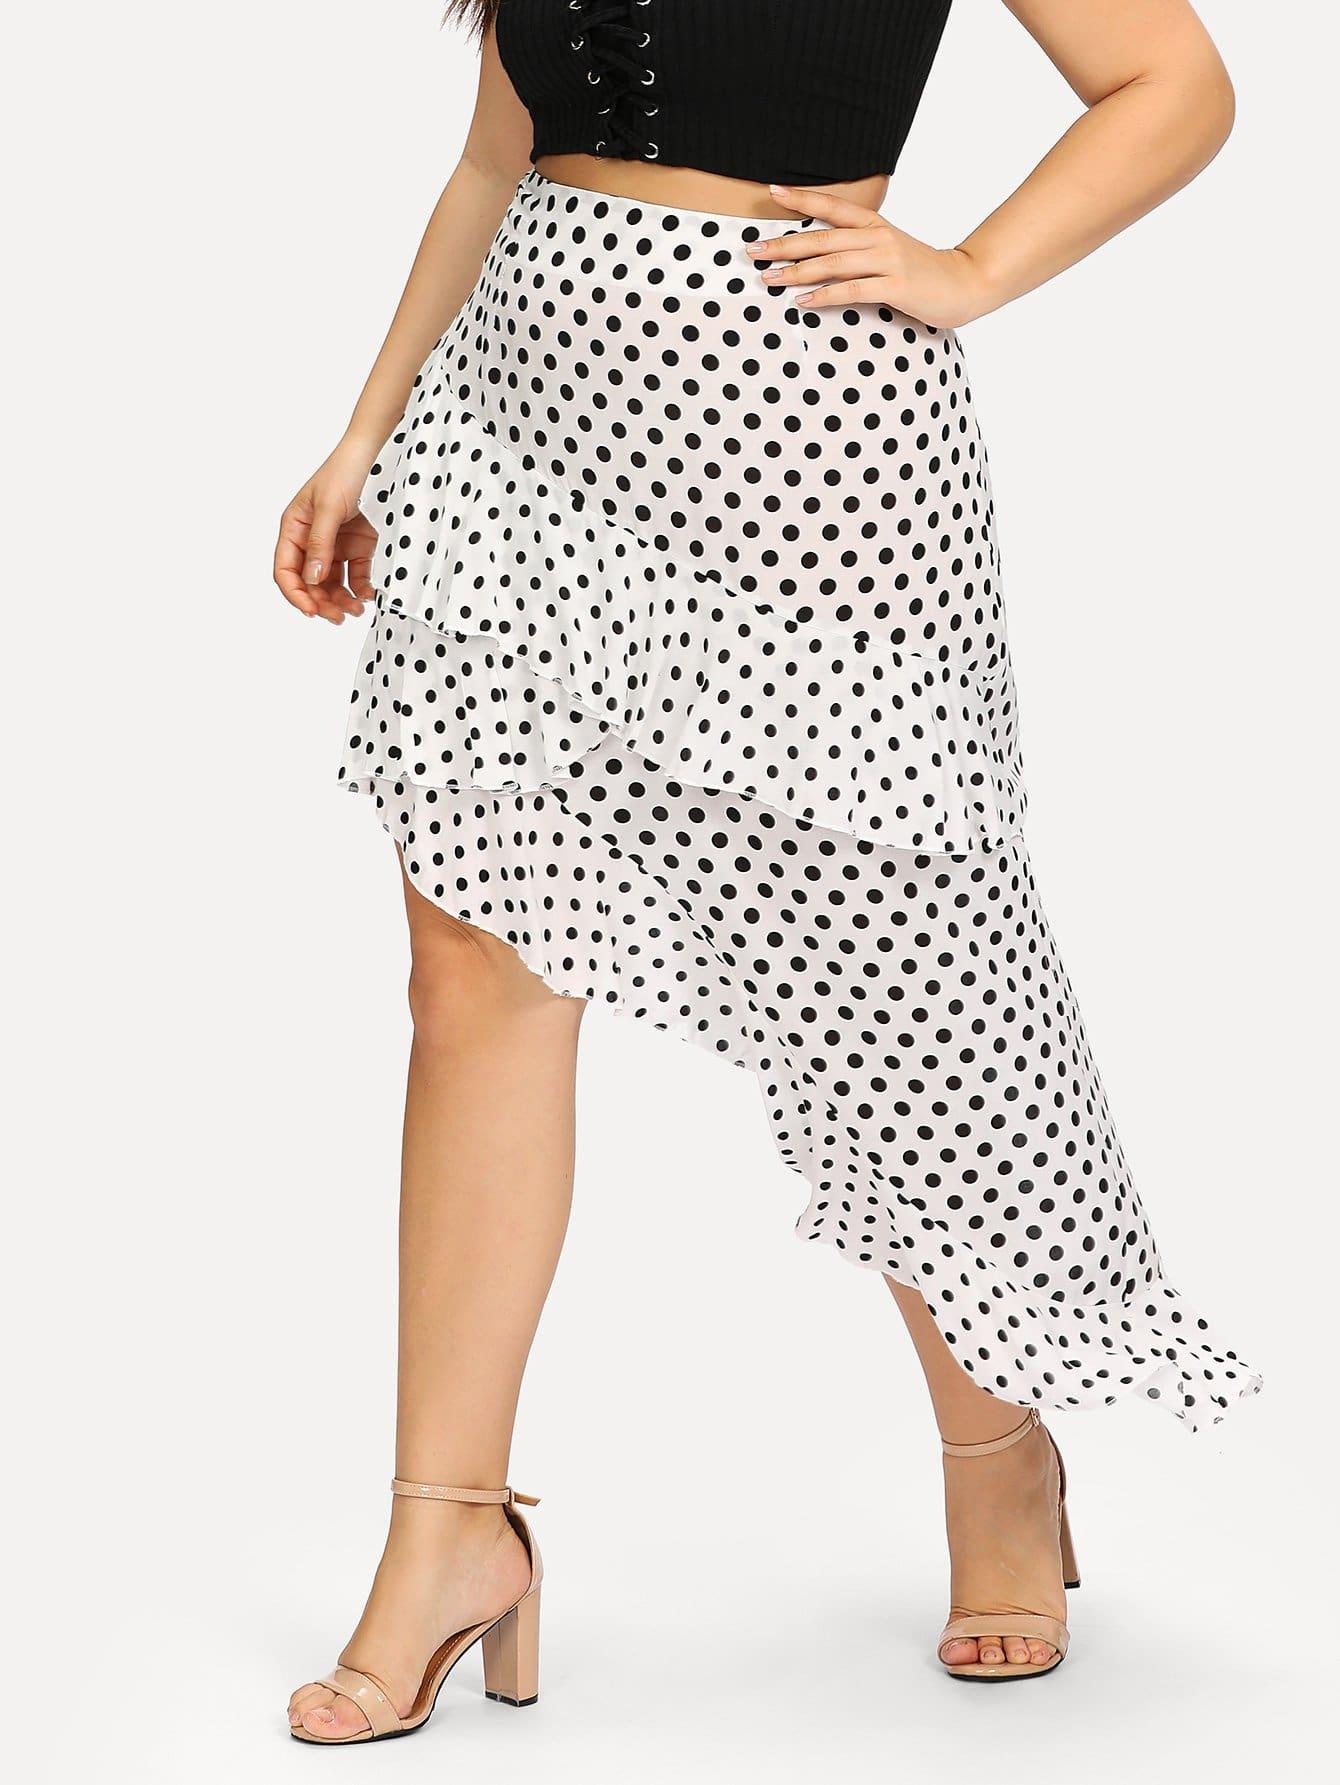 Layered Asymmetrical Ruffle Hem Polka Dot Skirt layered ruffle skirt pants